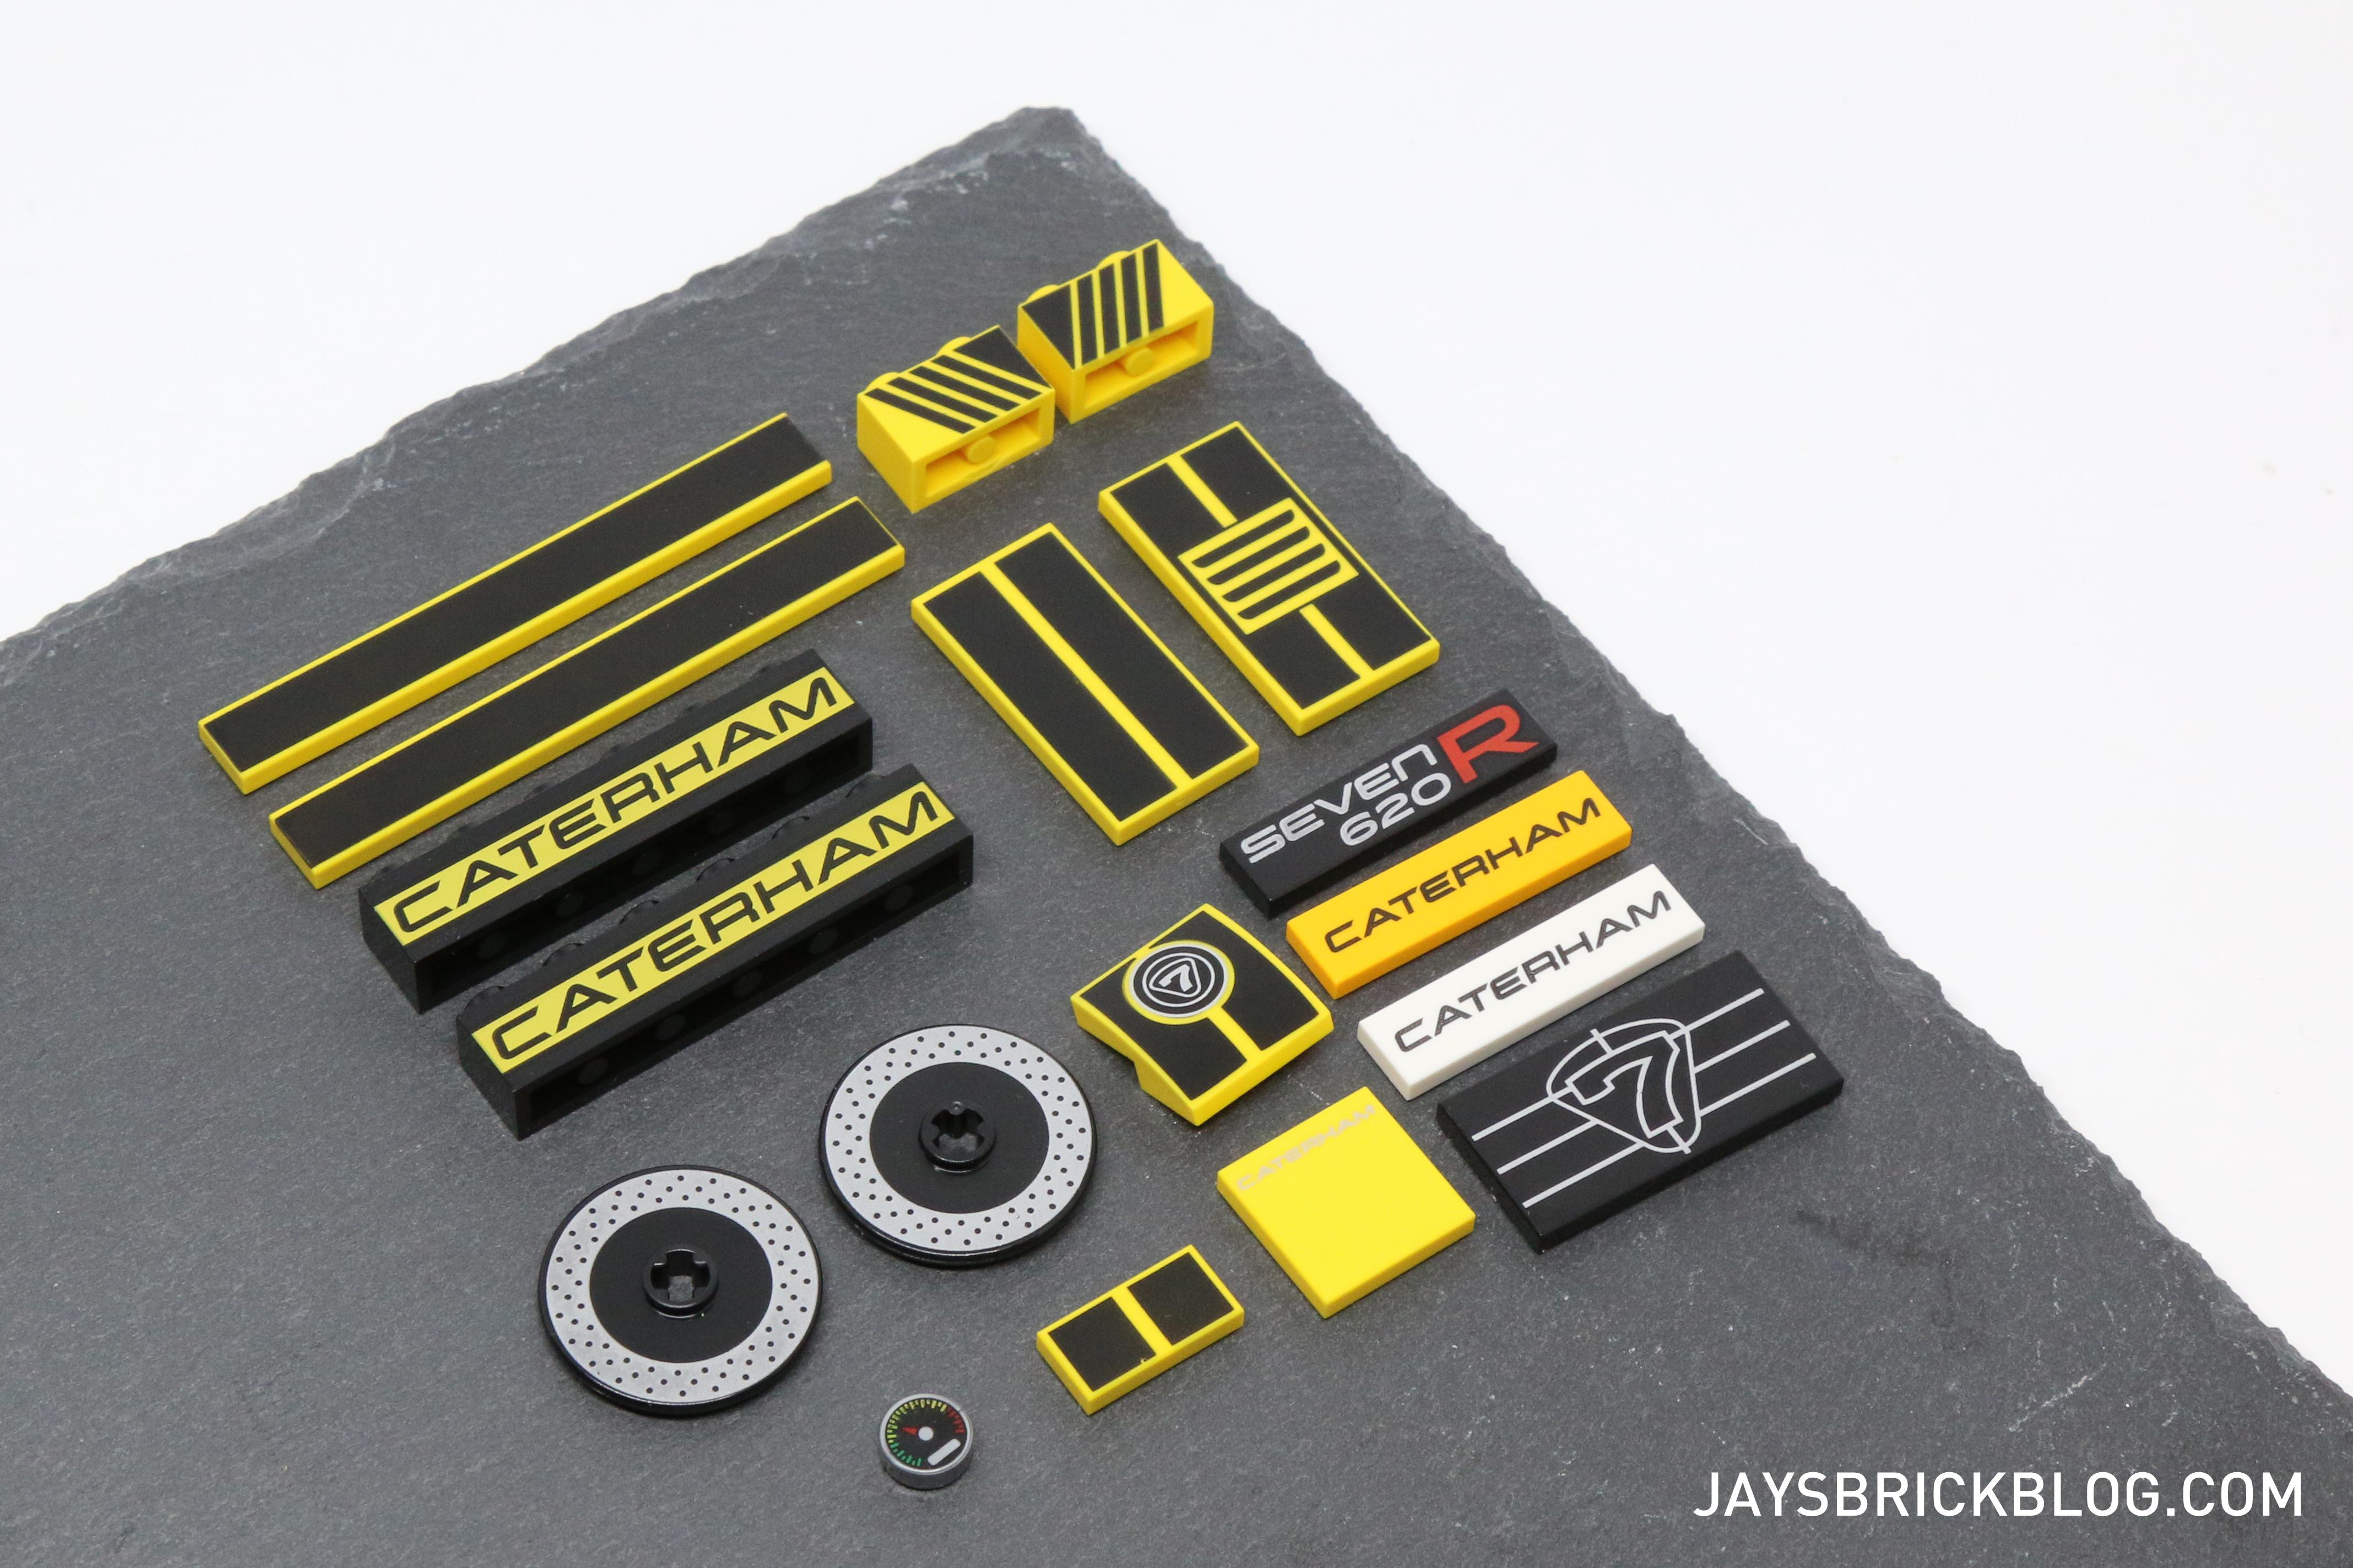 lego-21307-caterham-seven-printed-parts